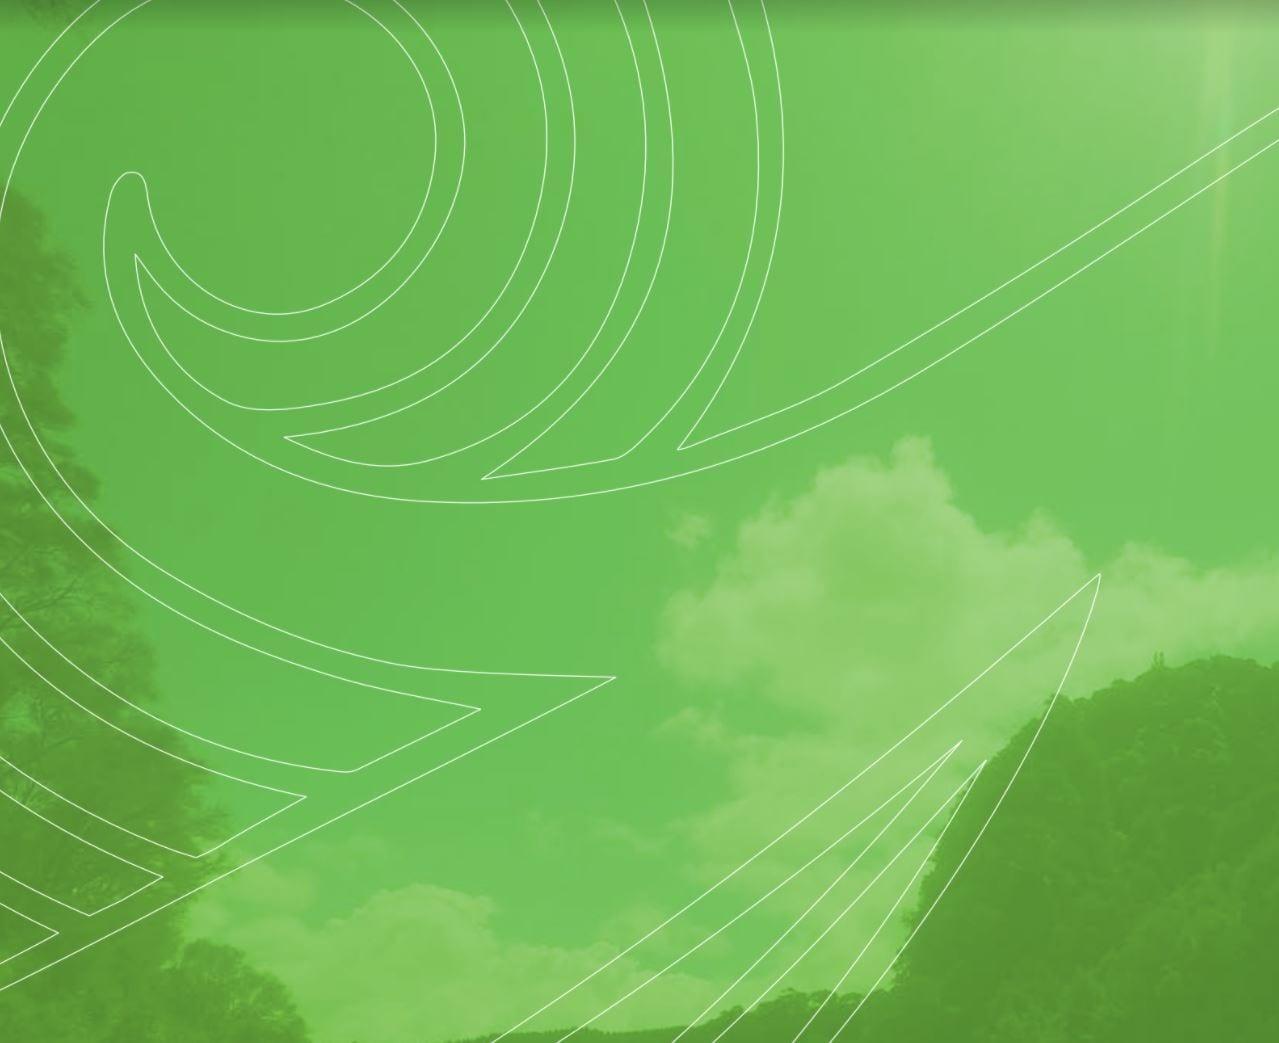 NGĀTI PĀHAUWERA DEVELOPMENT TRUST | 2020 Annual General Meeting | Agenda & Annual Report